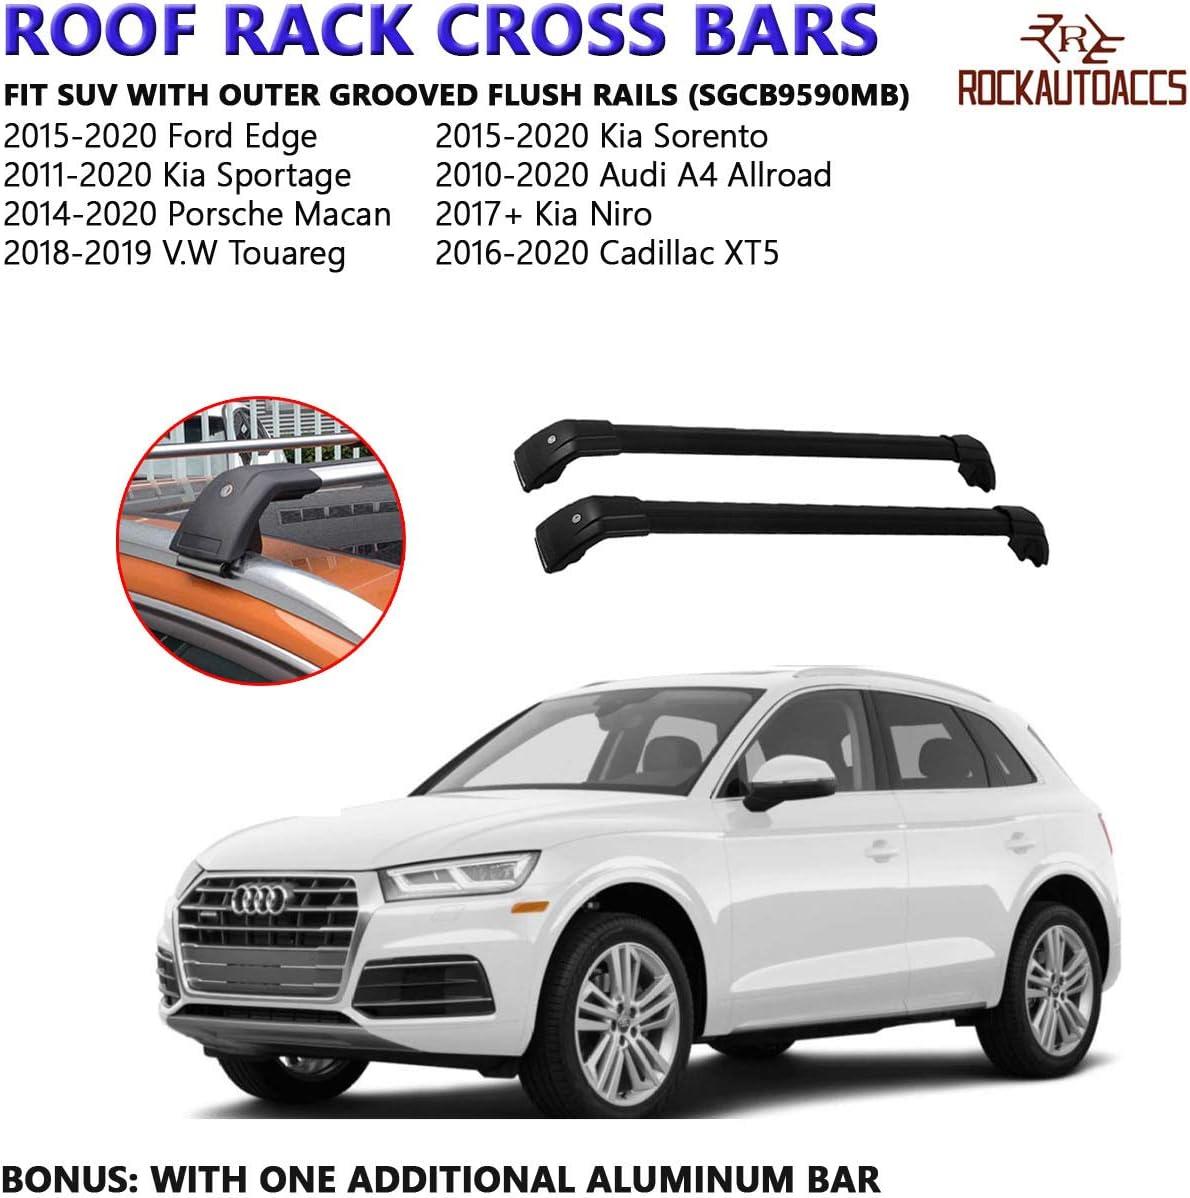 ROKIOTOEX Multi-Fit Roof Rack Crossbar Flush Rails Cross Bars Rooftop Ski Bike Rack Side Rail Luggage Carrier Cargo Box Aluminum Lockable 1 Pair Black SGCB9590MB